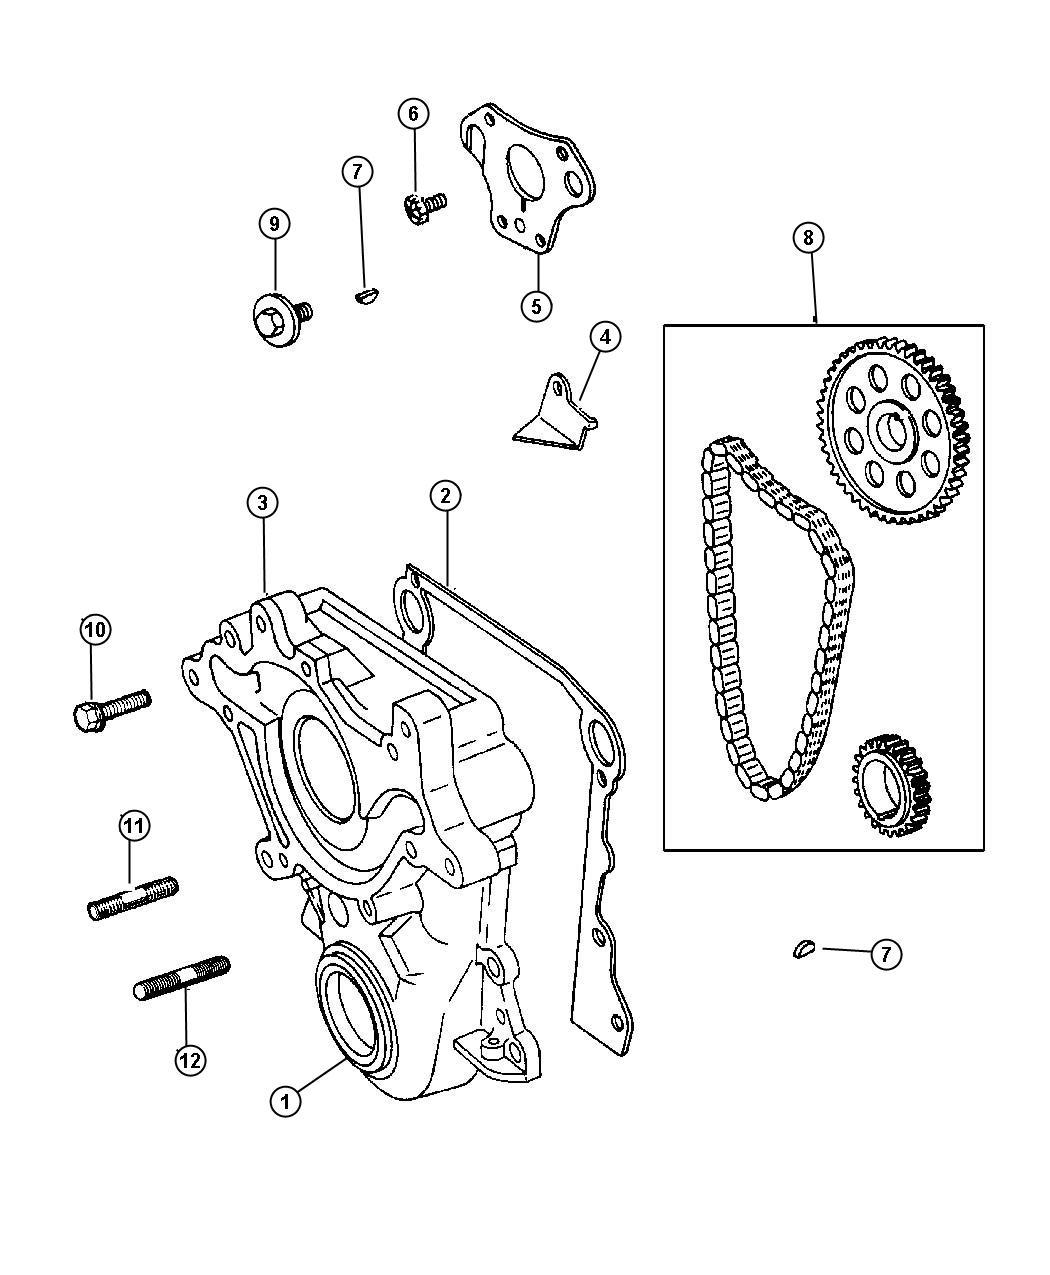 Dodge Dakota Timing Belt And Cover